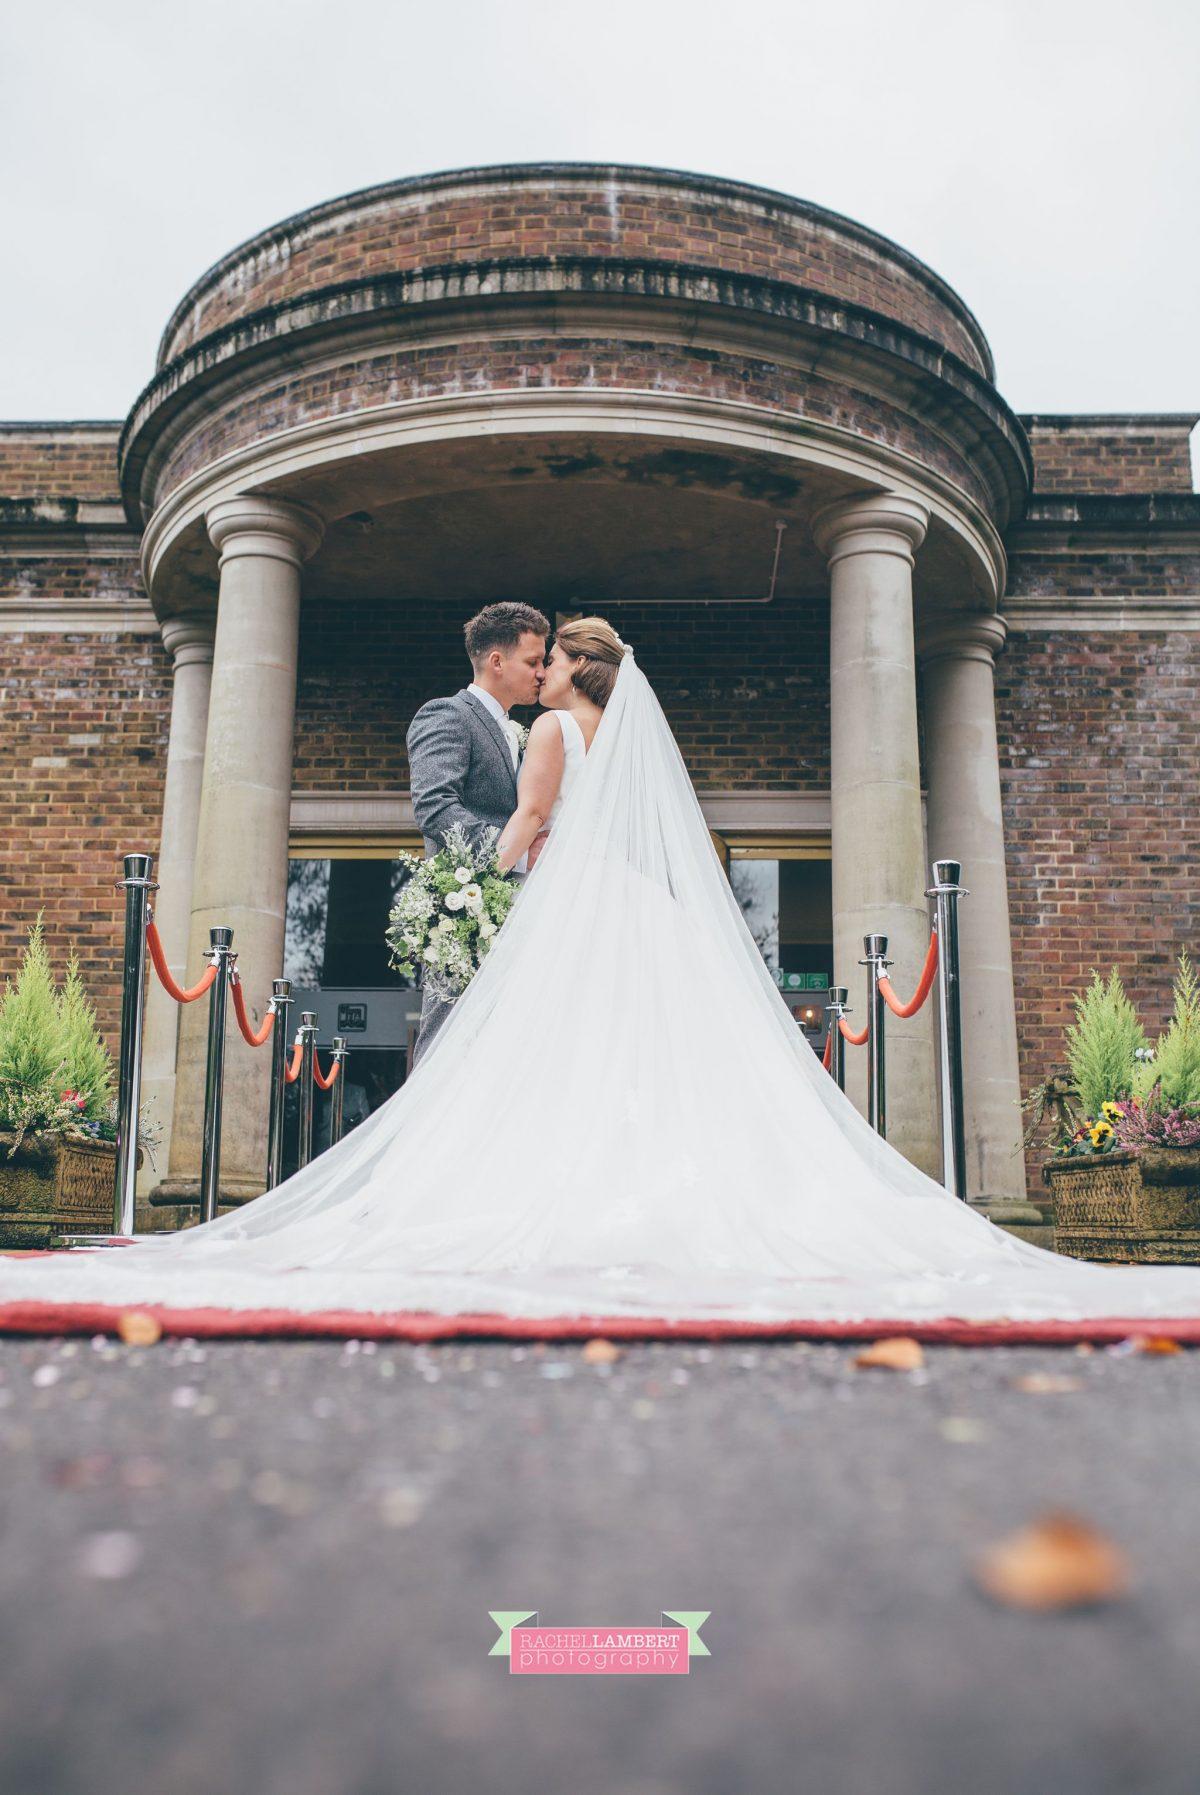 welsh_wedding_photographer_rachel_lambert_photography_decourceys_manor_cardiff_ceri_chris_ 36